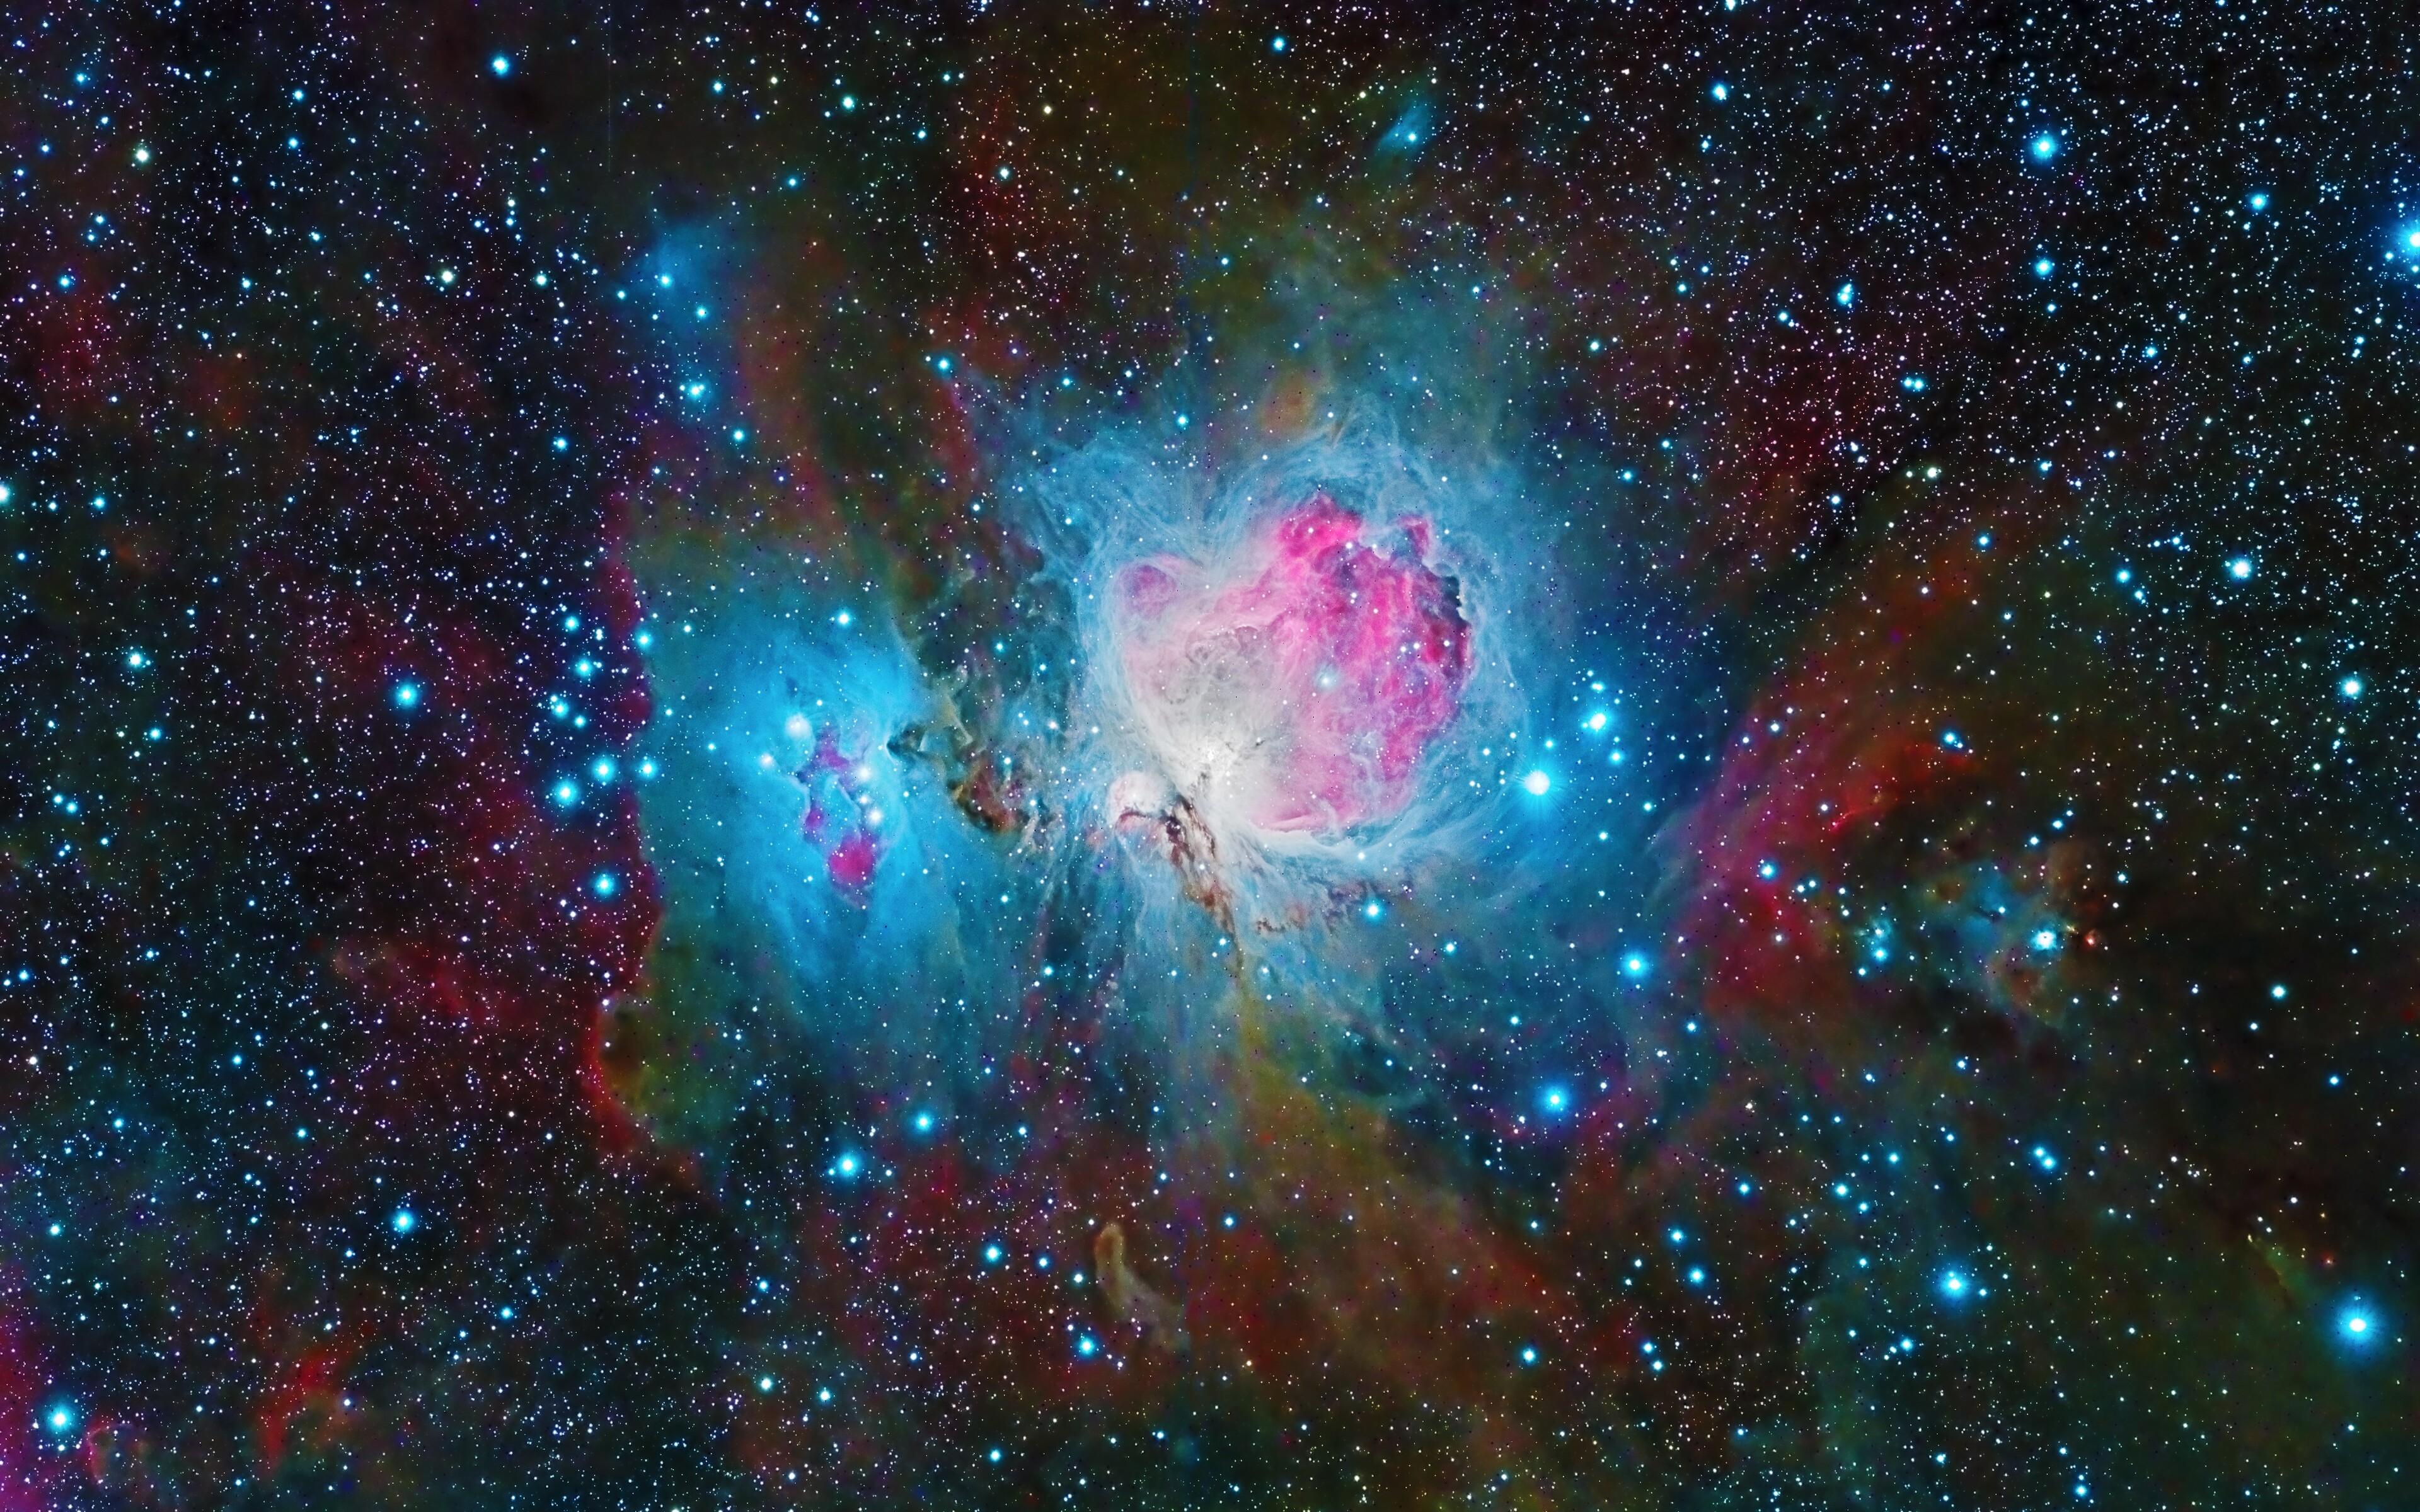 3840x2400 nebula space galaxy colorful 4k 4k hd 4k wallpapers